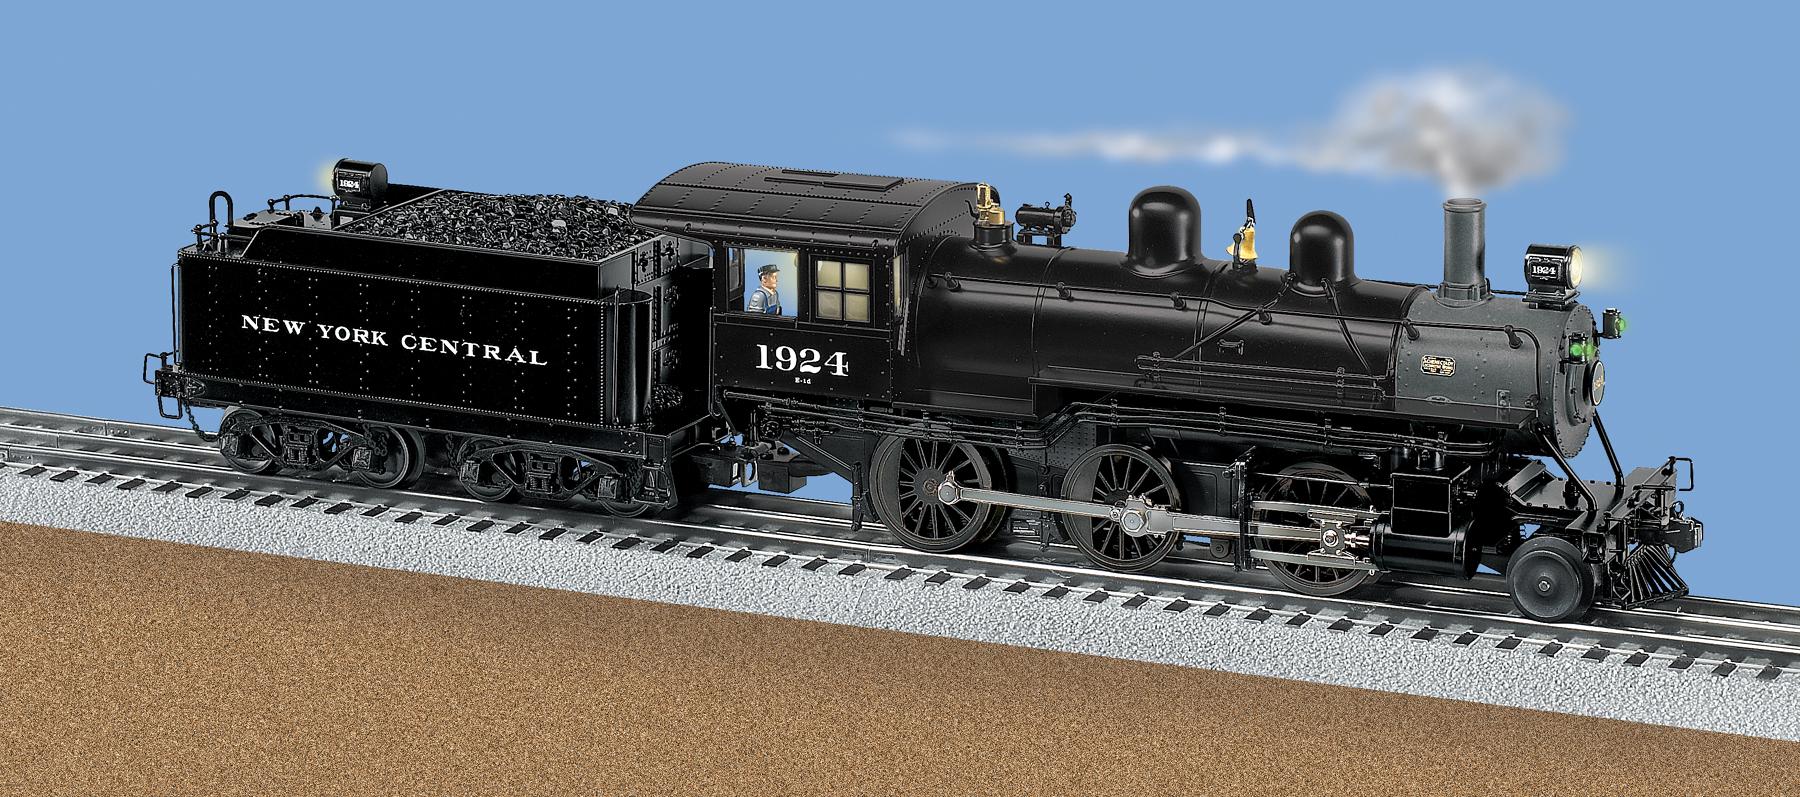 medium resolution of new york central tmcc scale 2 6 0 mogul steam locomotive 1924 rh lionel com lionel lionel locomotive wiring diagram